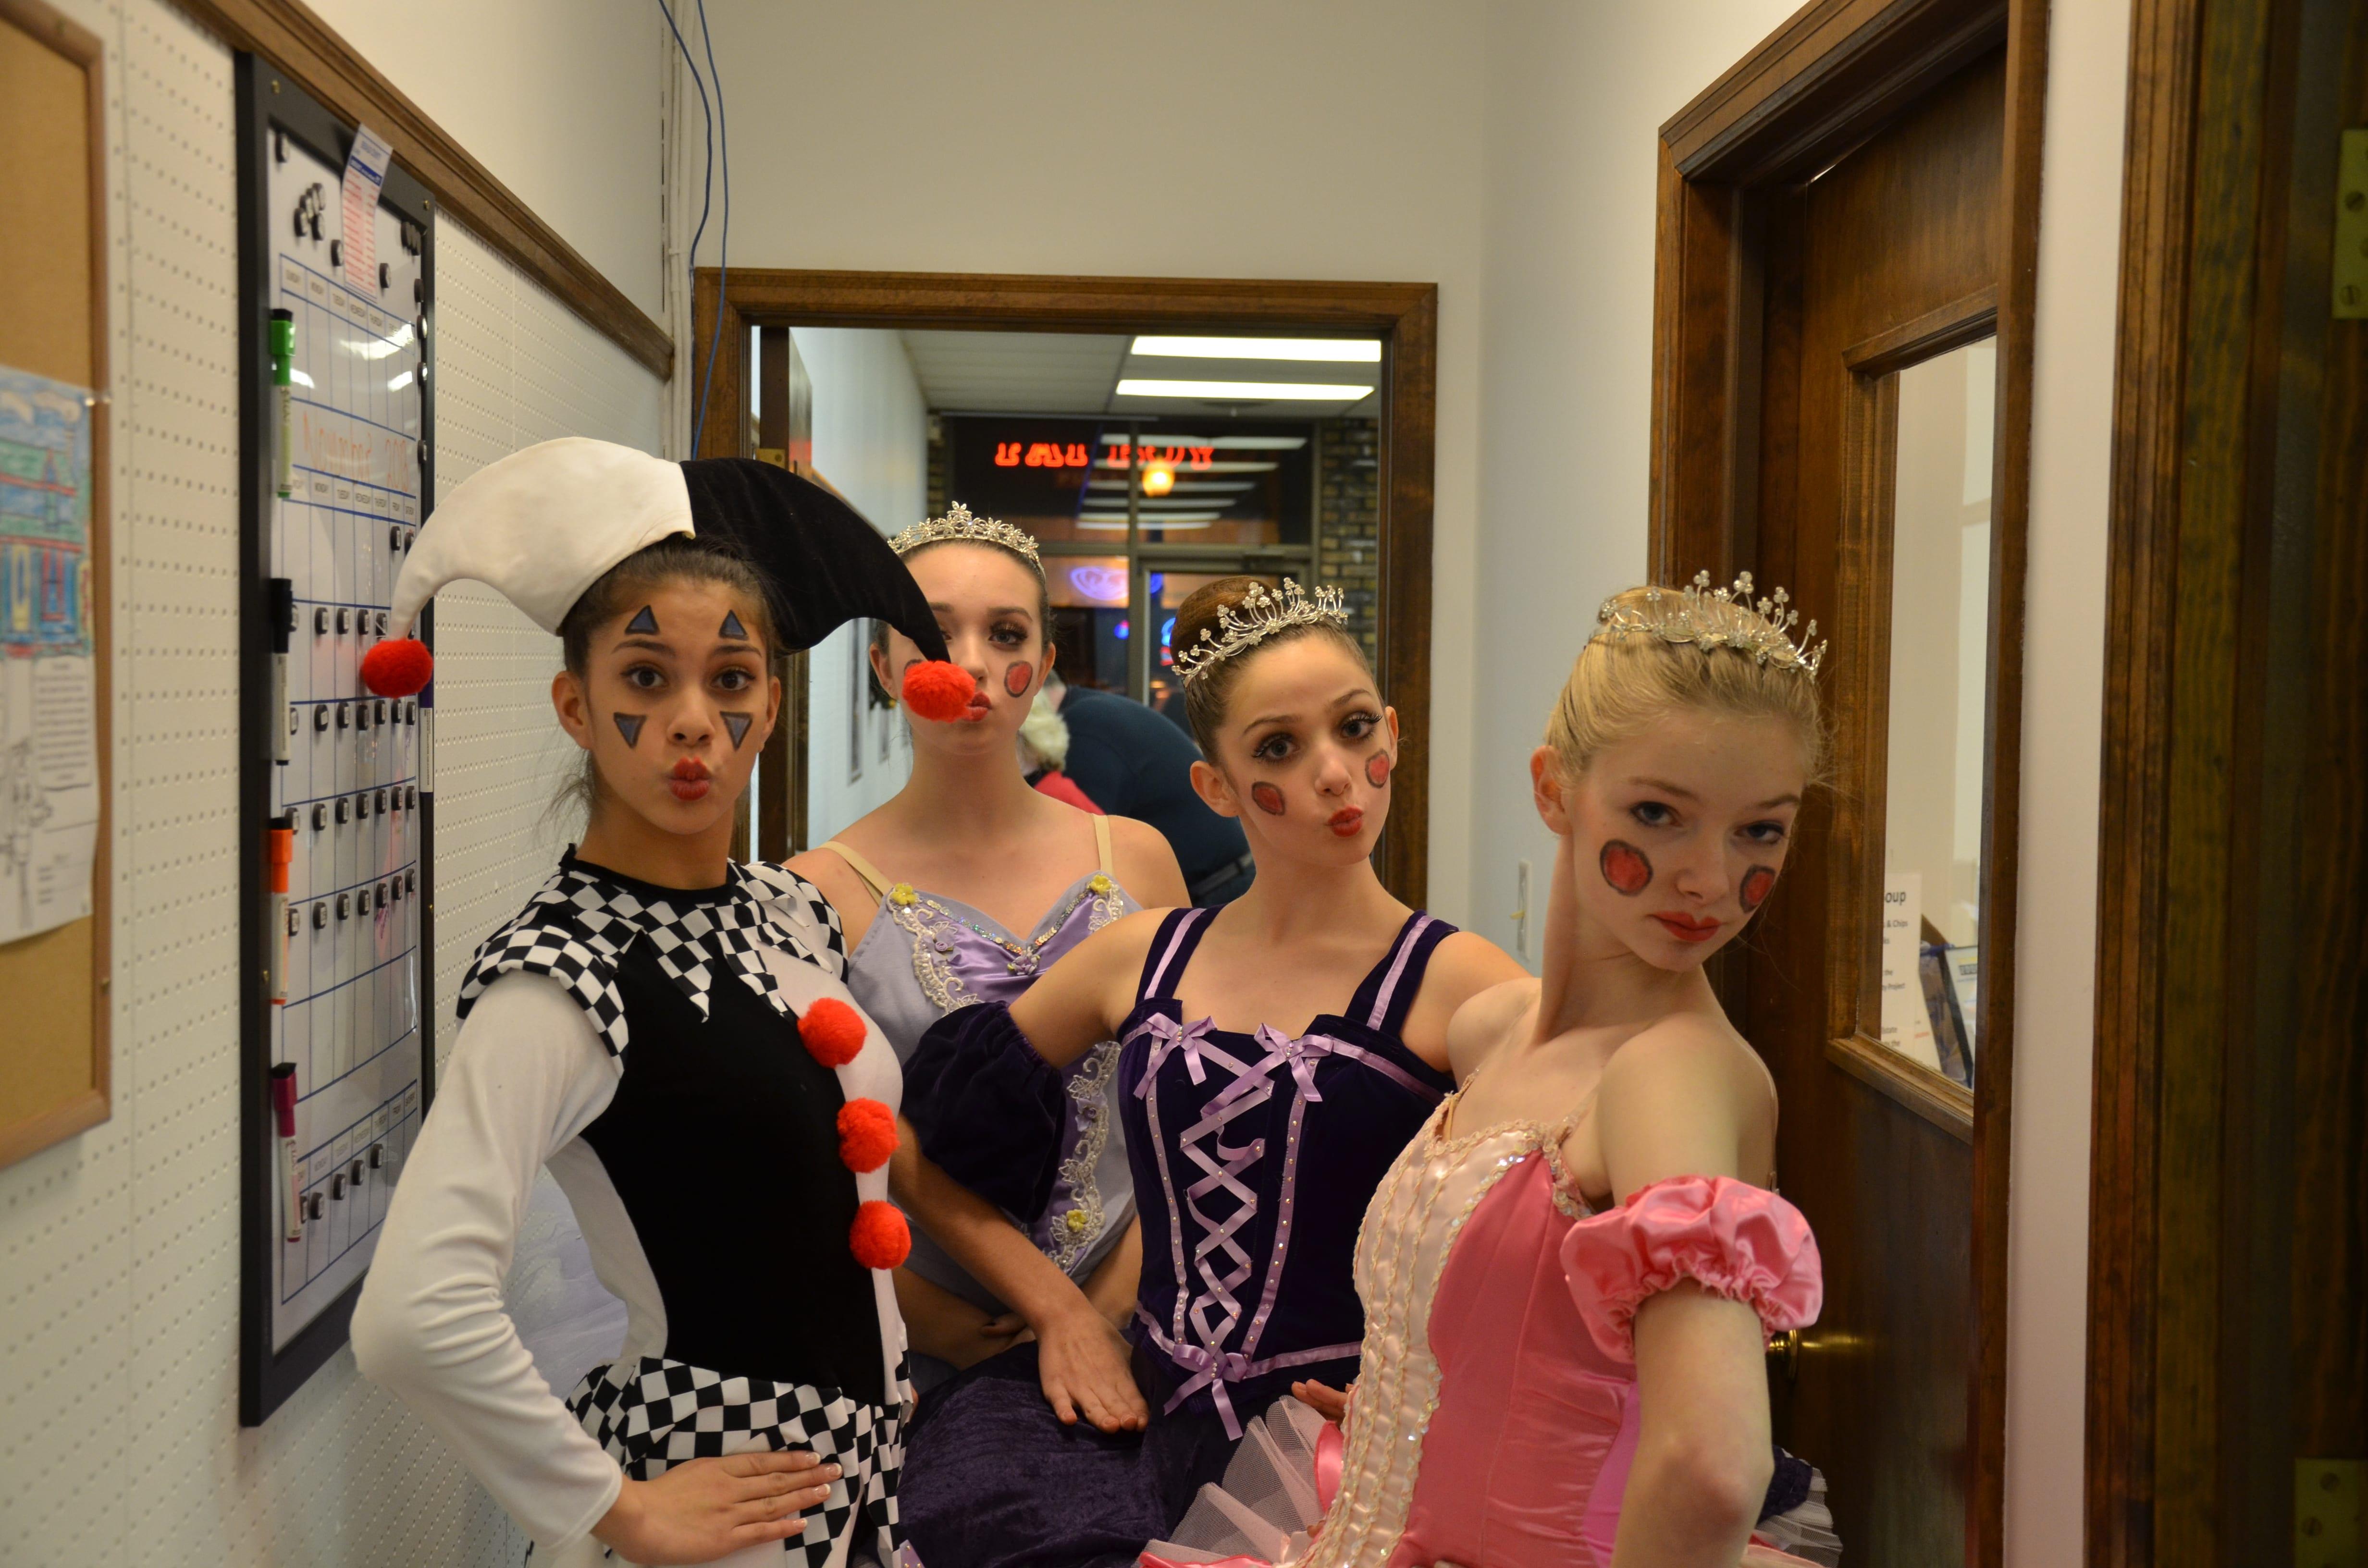 008 – Beth Fowler School of Dance : Genoa and St. Charles Illinois